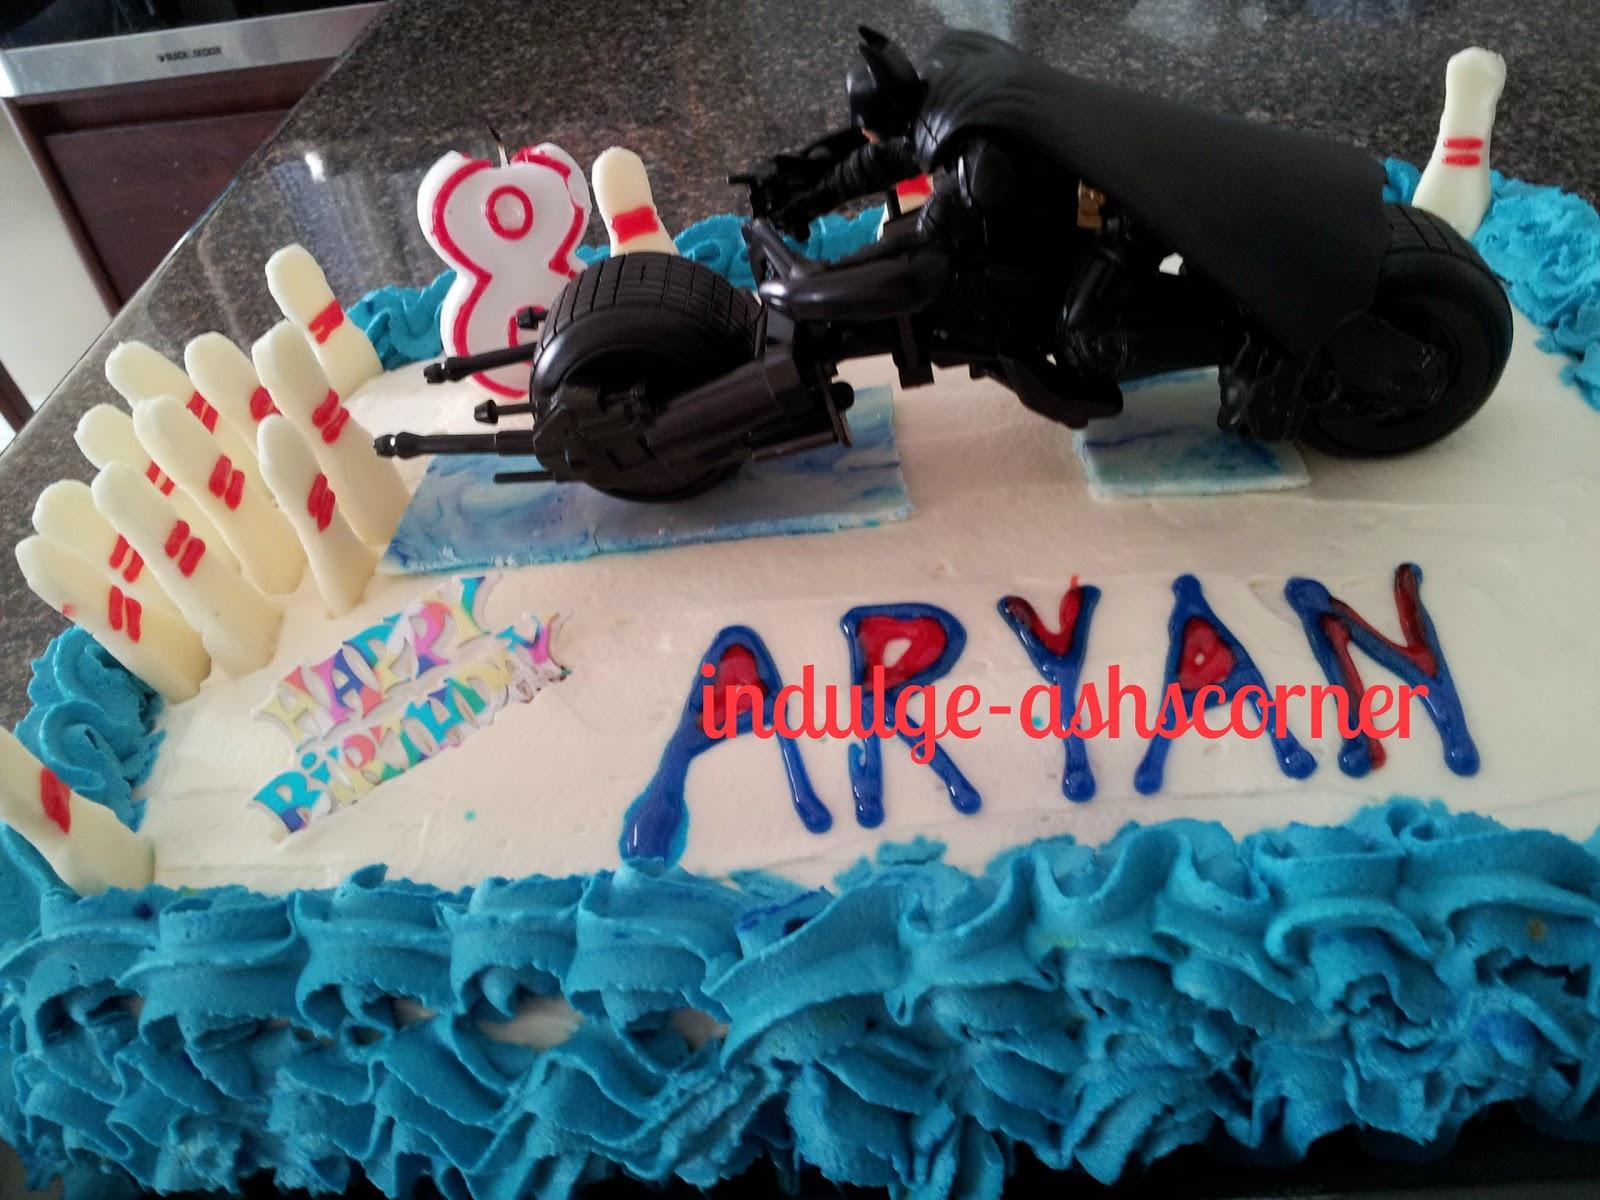 IndulgeAshscorner Batman The Dark Knight On The Bowling Track Cake - Dark knight birthday cake